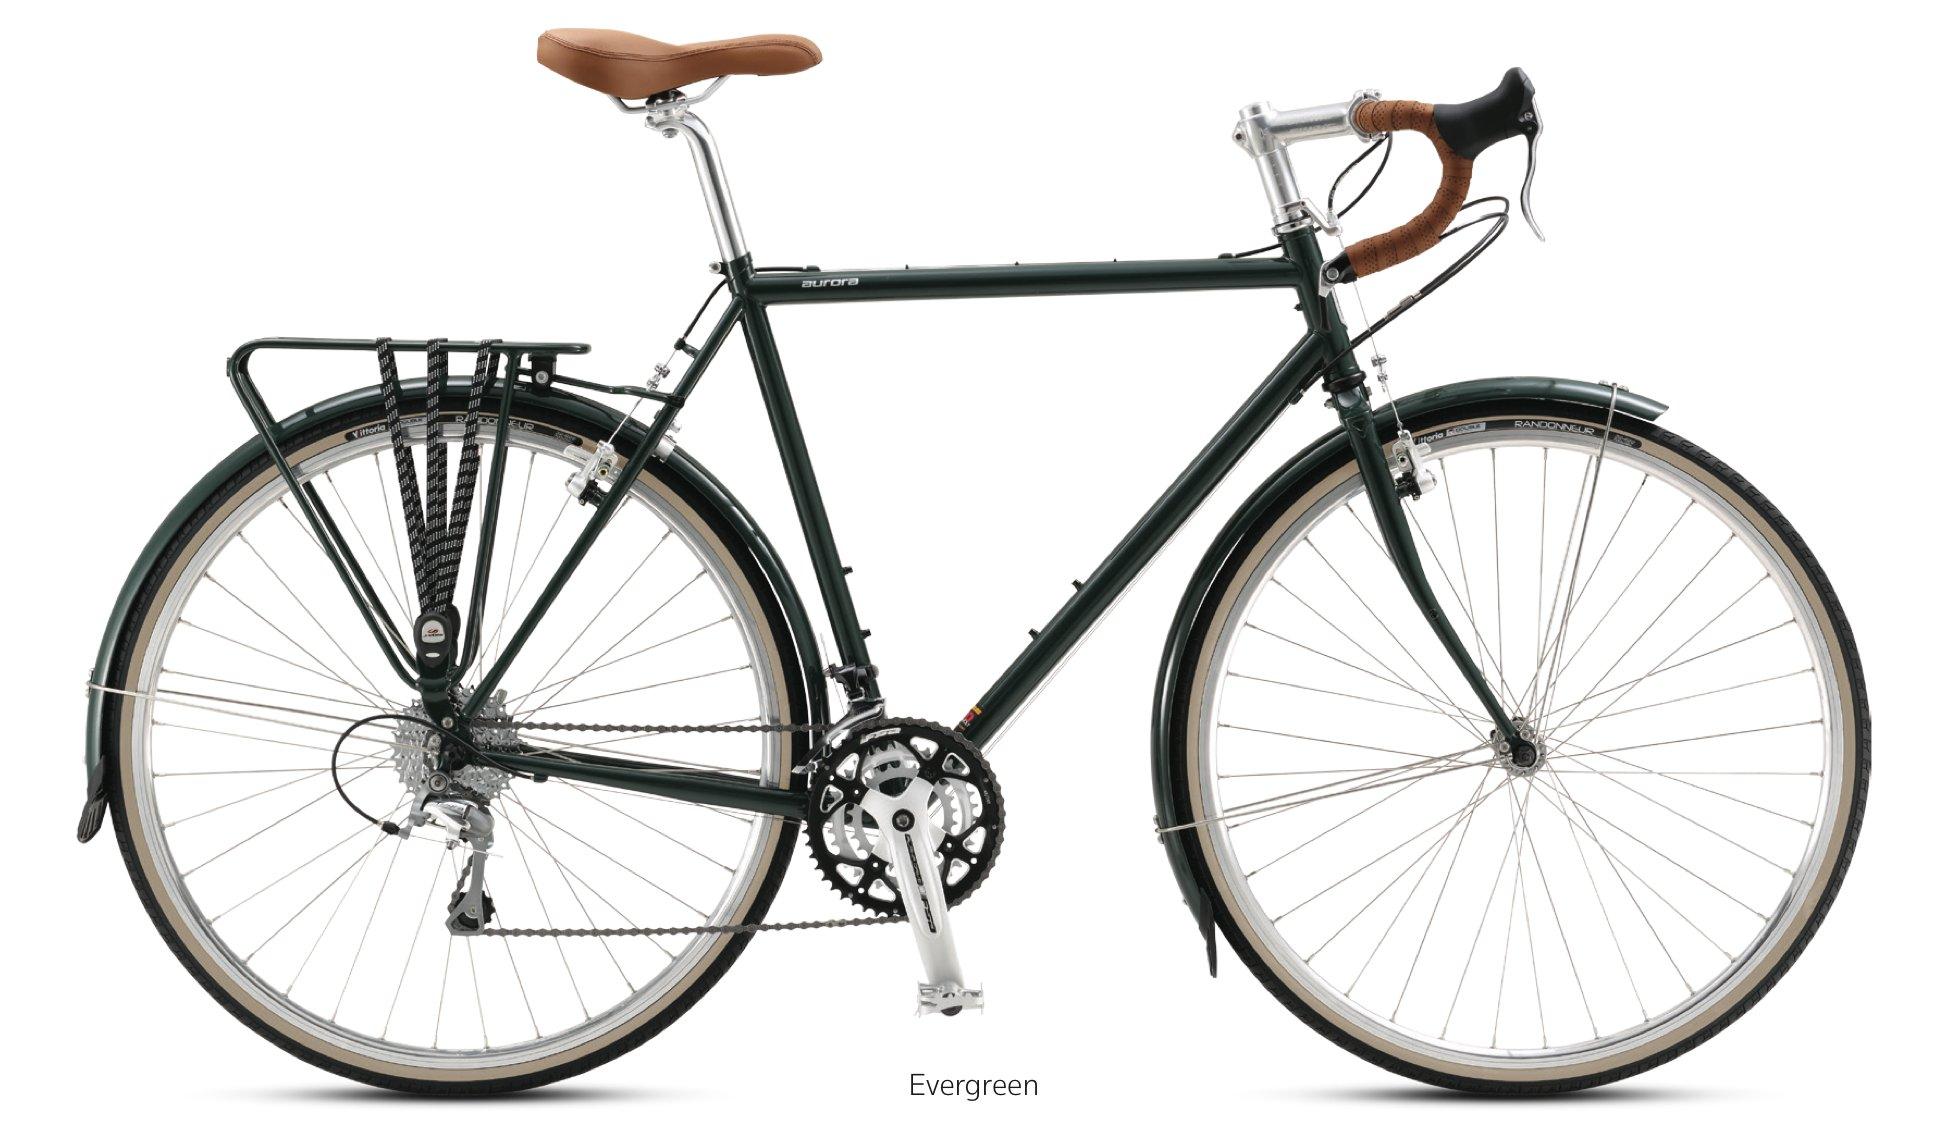 The New 2016 Jamis Aurora and Aurora Elite Touring Bikes